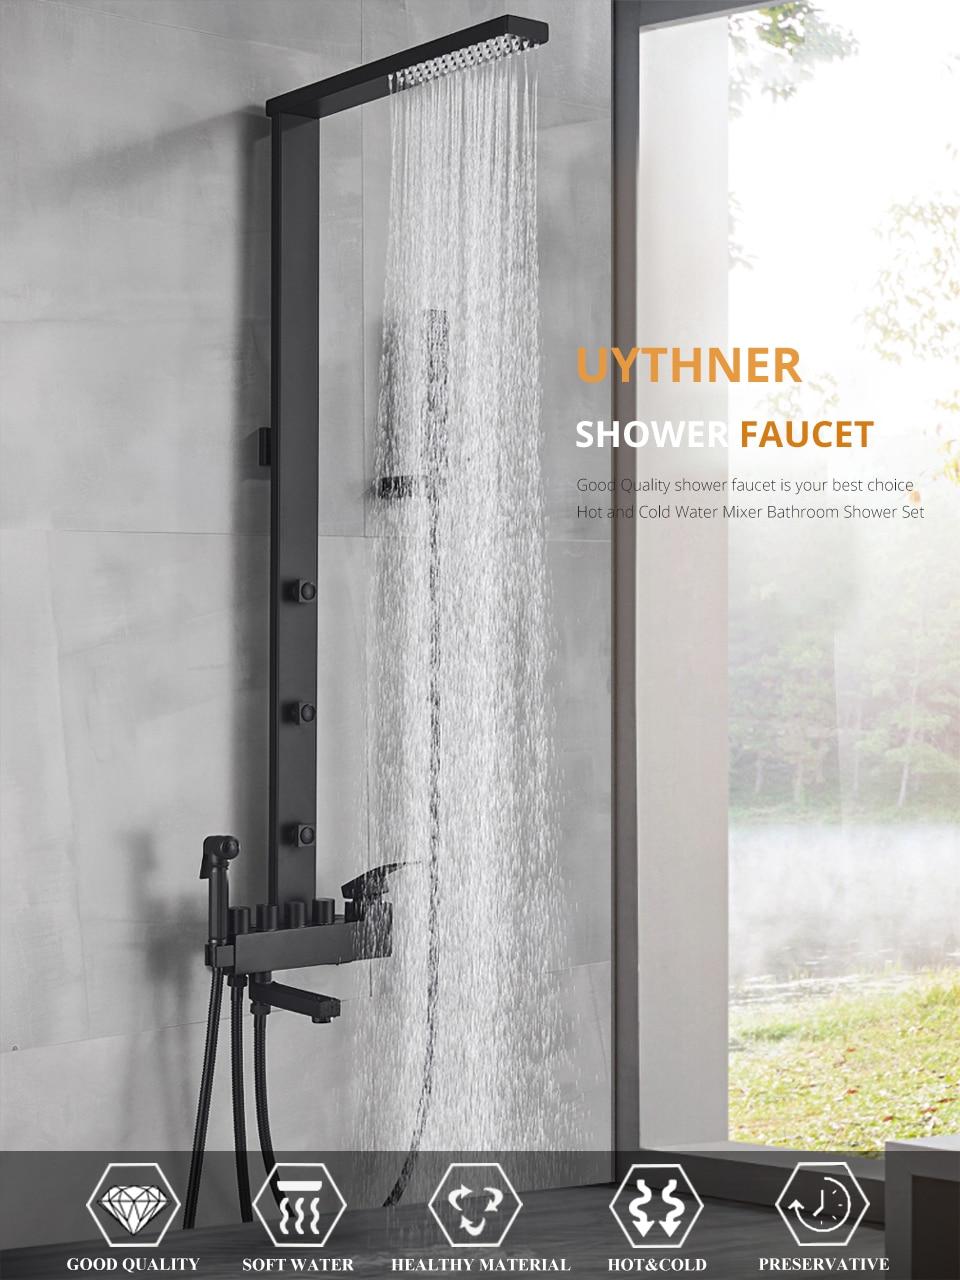 H51fc117a5a9e40fd8f0998b8f6683a82t Uythner Luxury Matte Black Bathroom Faucet Bath Rain Shower Faucet Wall Mounted Bathtub Shower Mixer Bidet Tap Shower Set Mixer